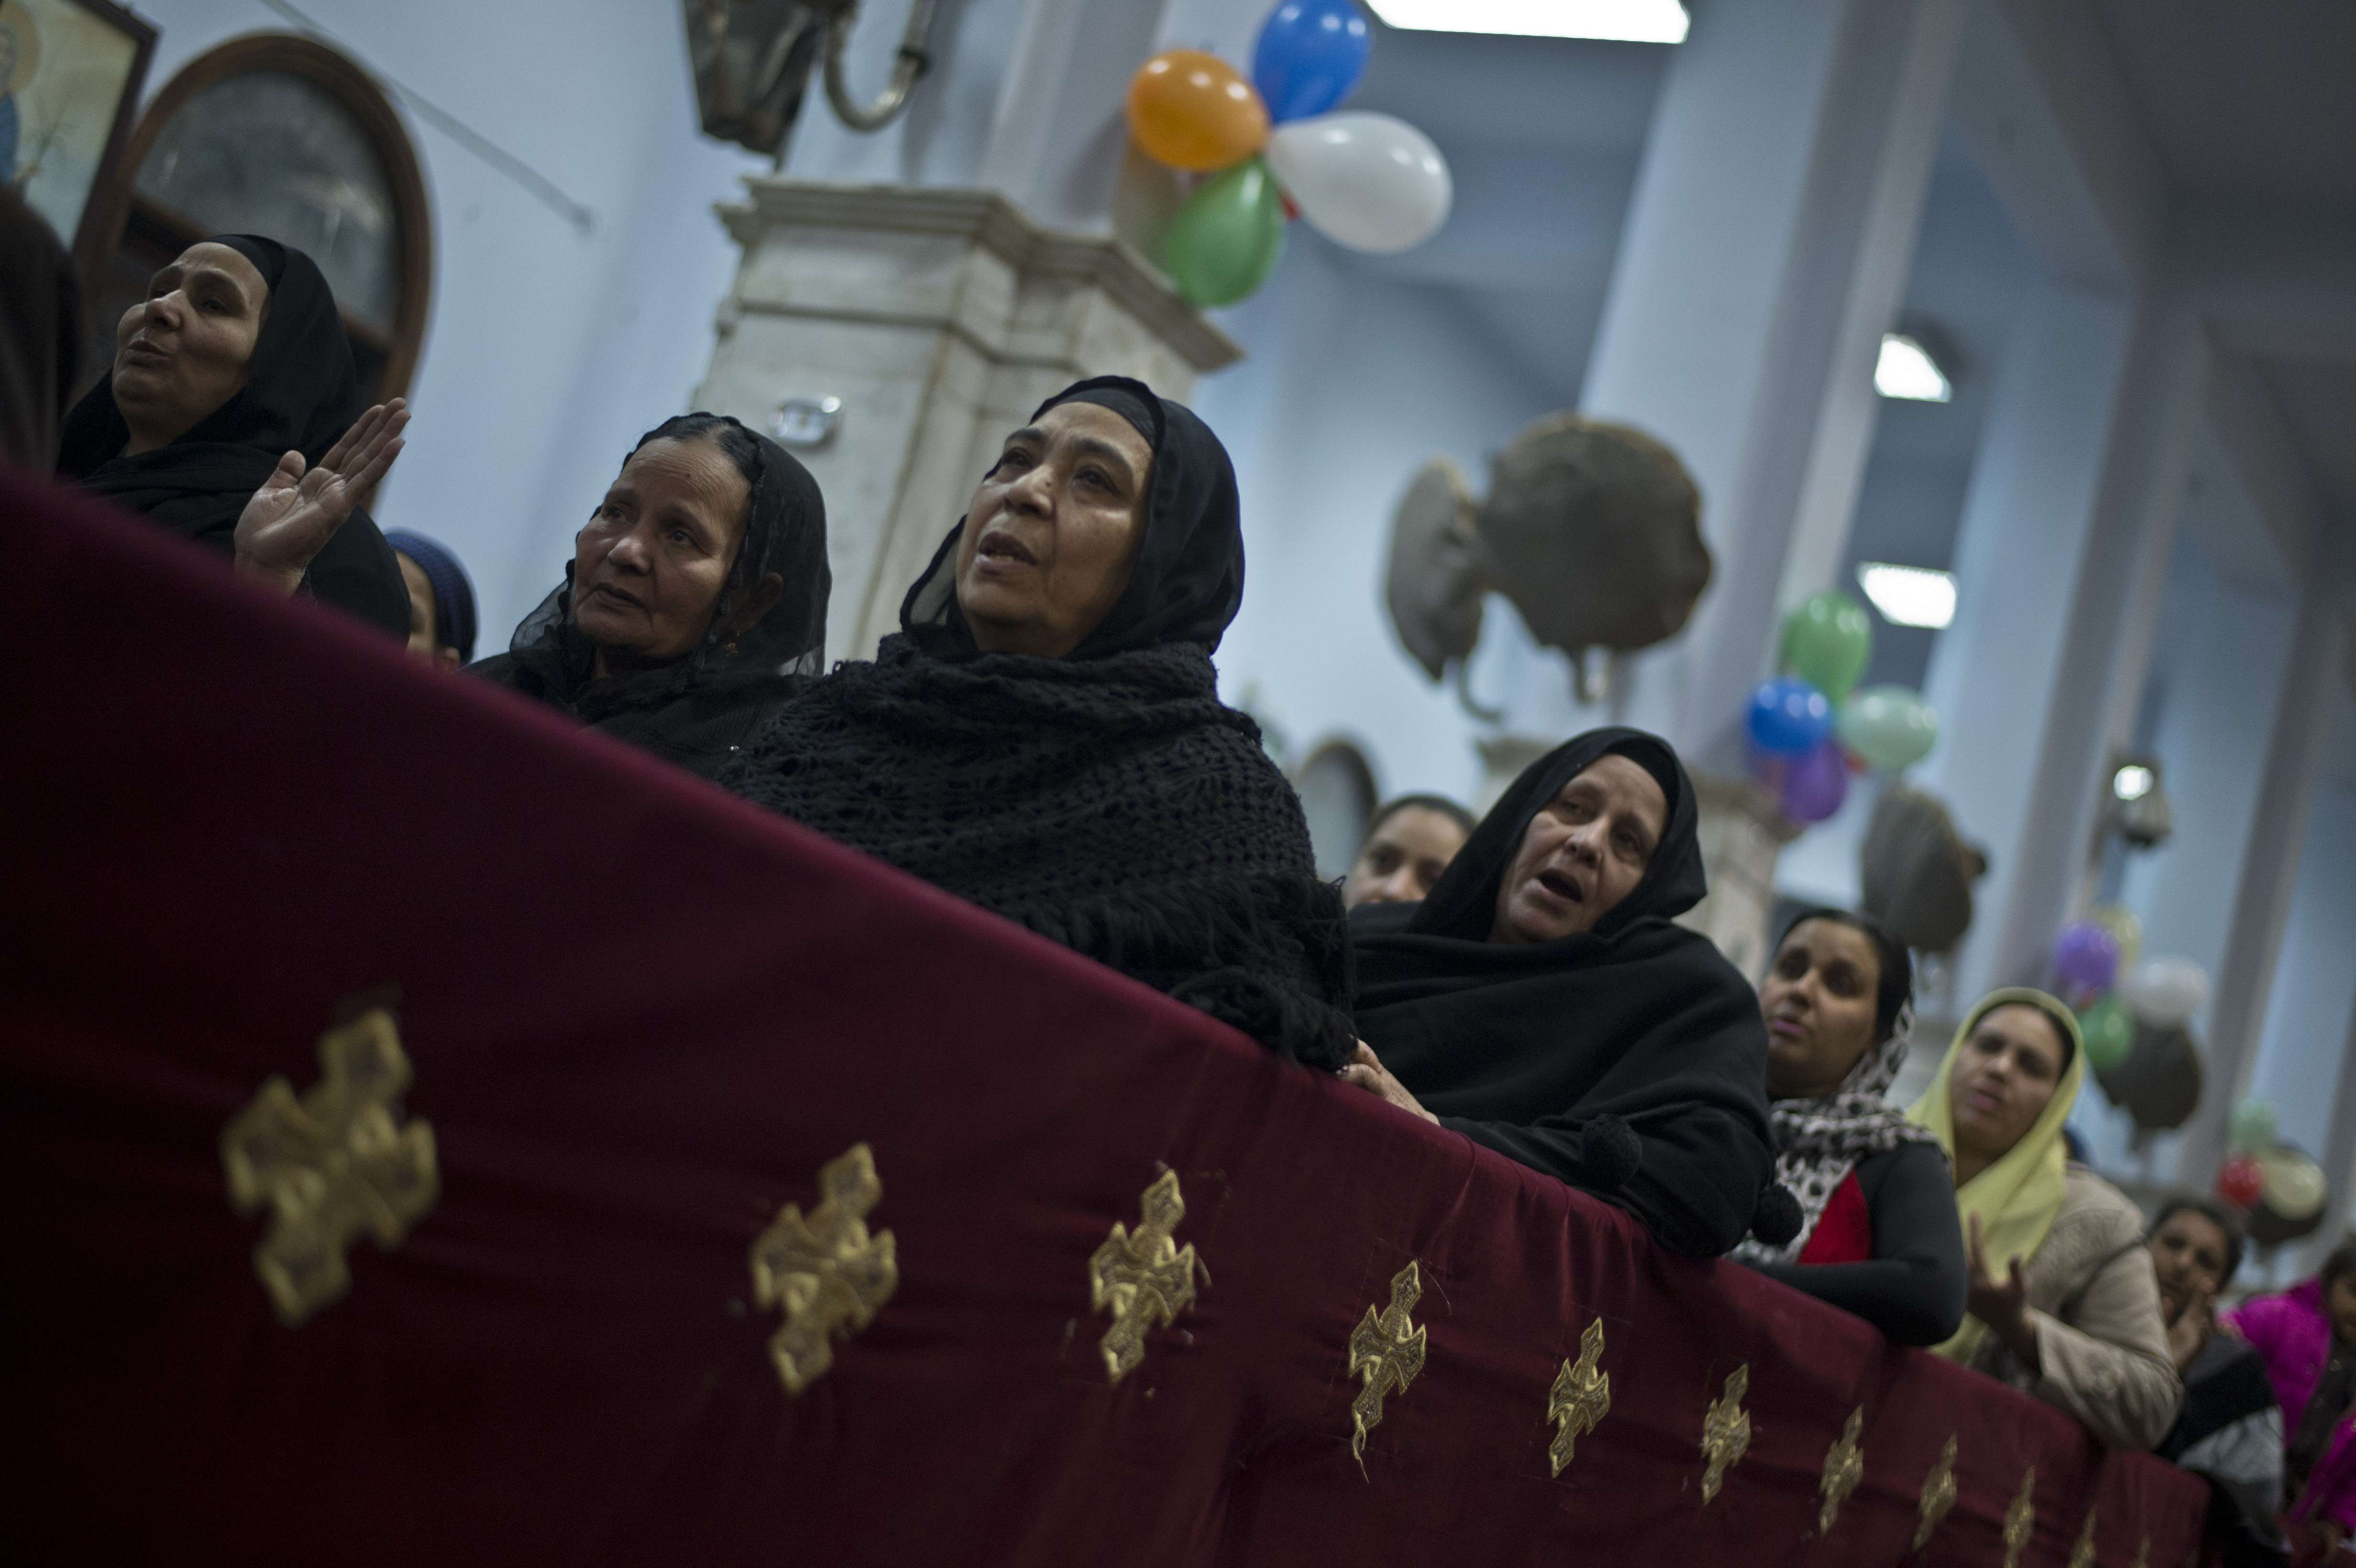 Egyptian Coptics attend the New Year mass service at the Virgin Mary Coptic Christian church in Cairo's working class neighborhood of Al-Warrak on December 31, 2013.    (AFP PHOTO / KHALED DESOUKI)